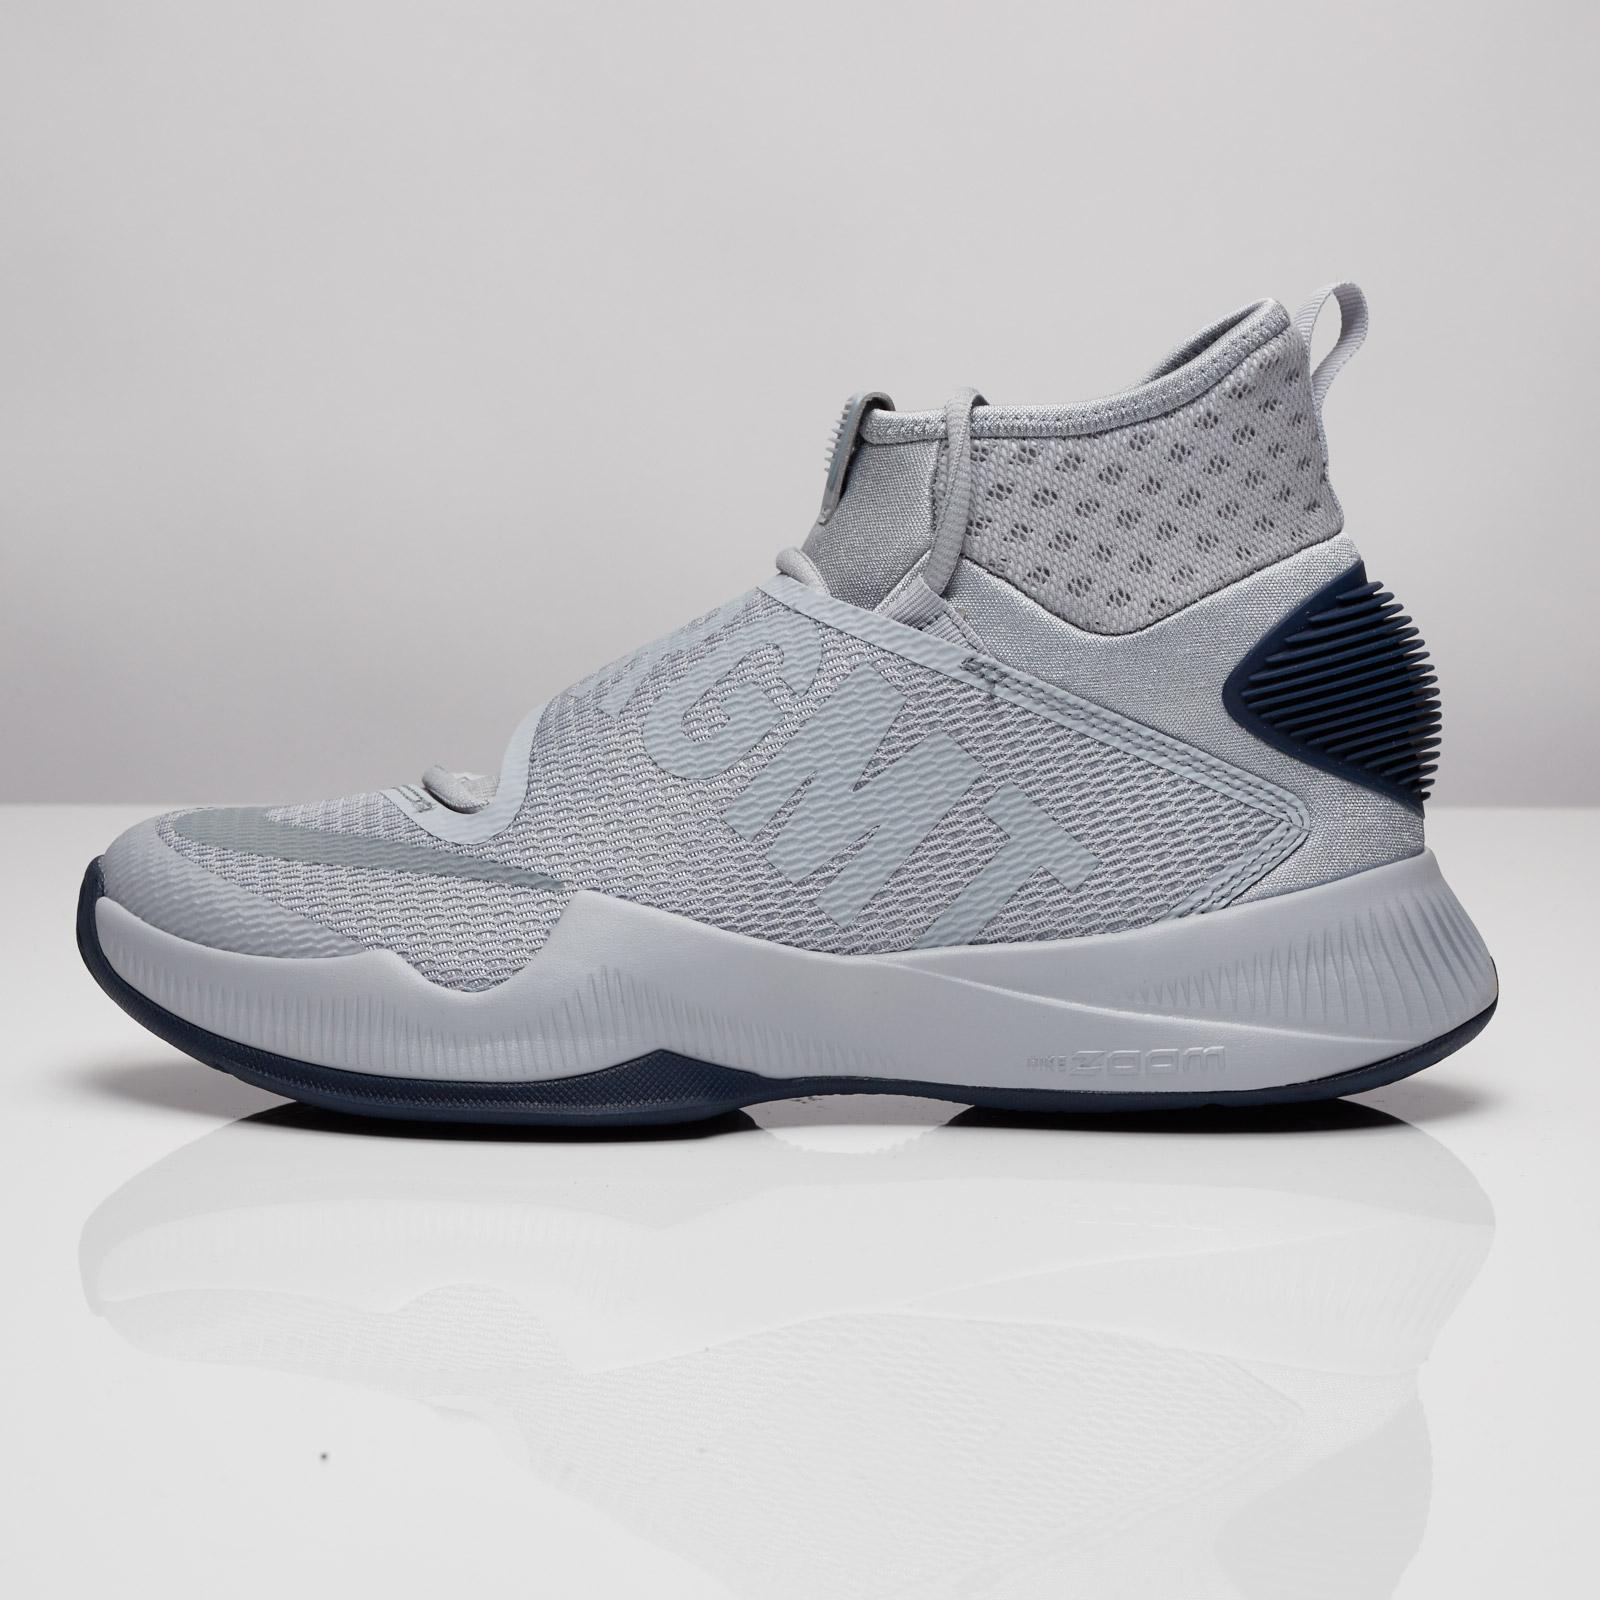 74f110cc78a3 Nike Zoom Hyperrev 2016 Fragment - 848556-004 - Sneakersnstuff ...